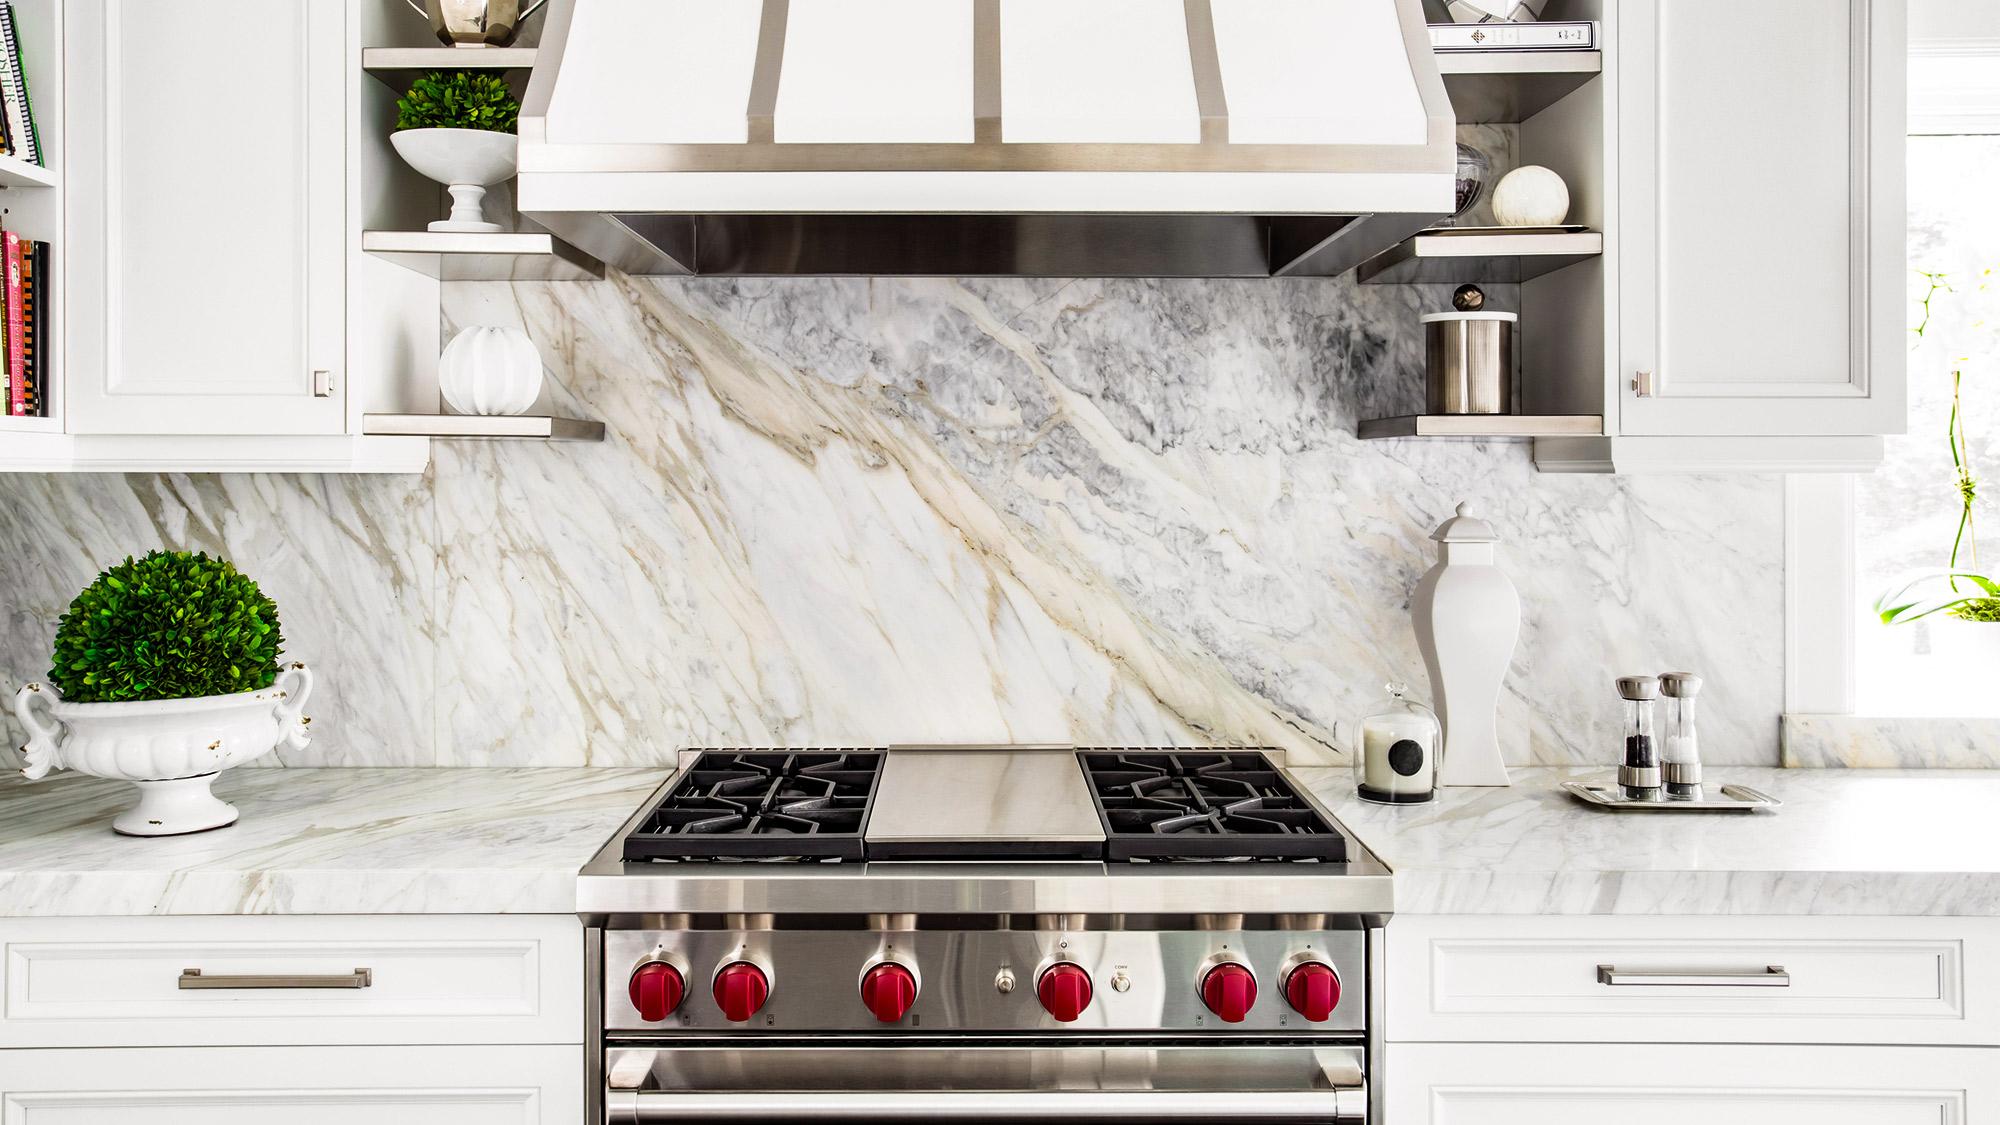 Beautiful kitchen backsplash tiles